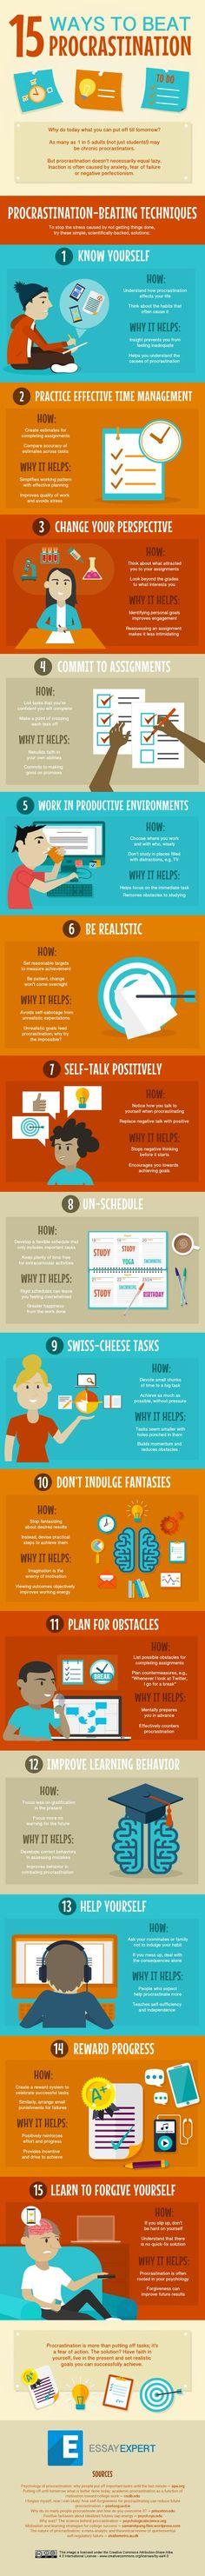 15 Ways to Overcome Procrastination and Get Stuff Done